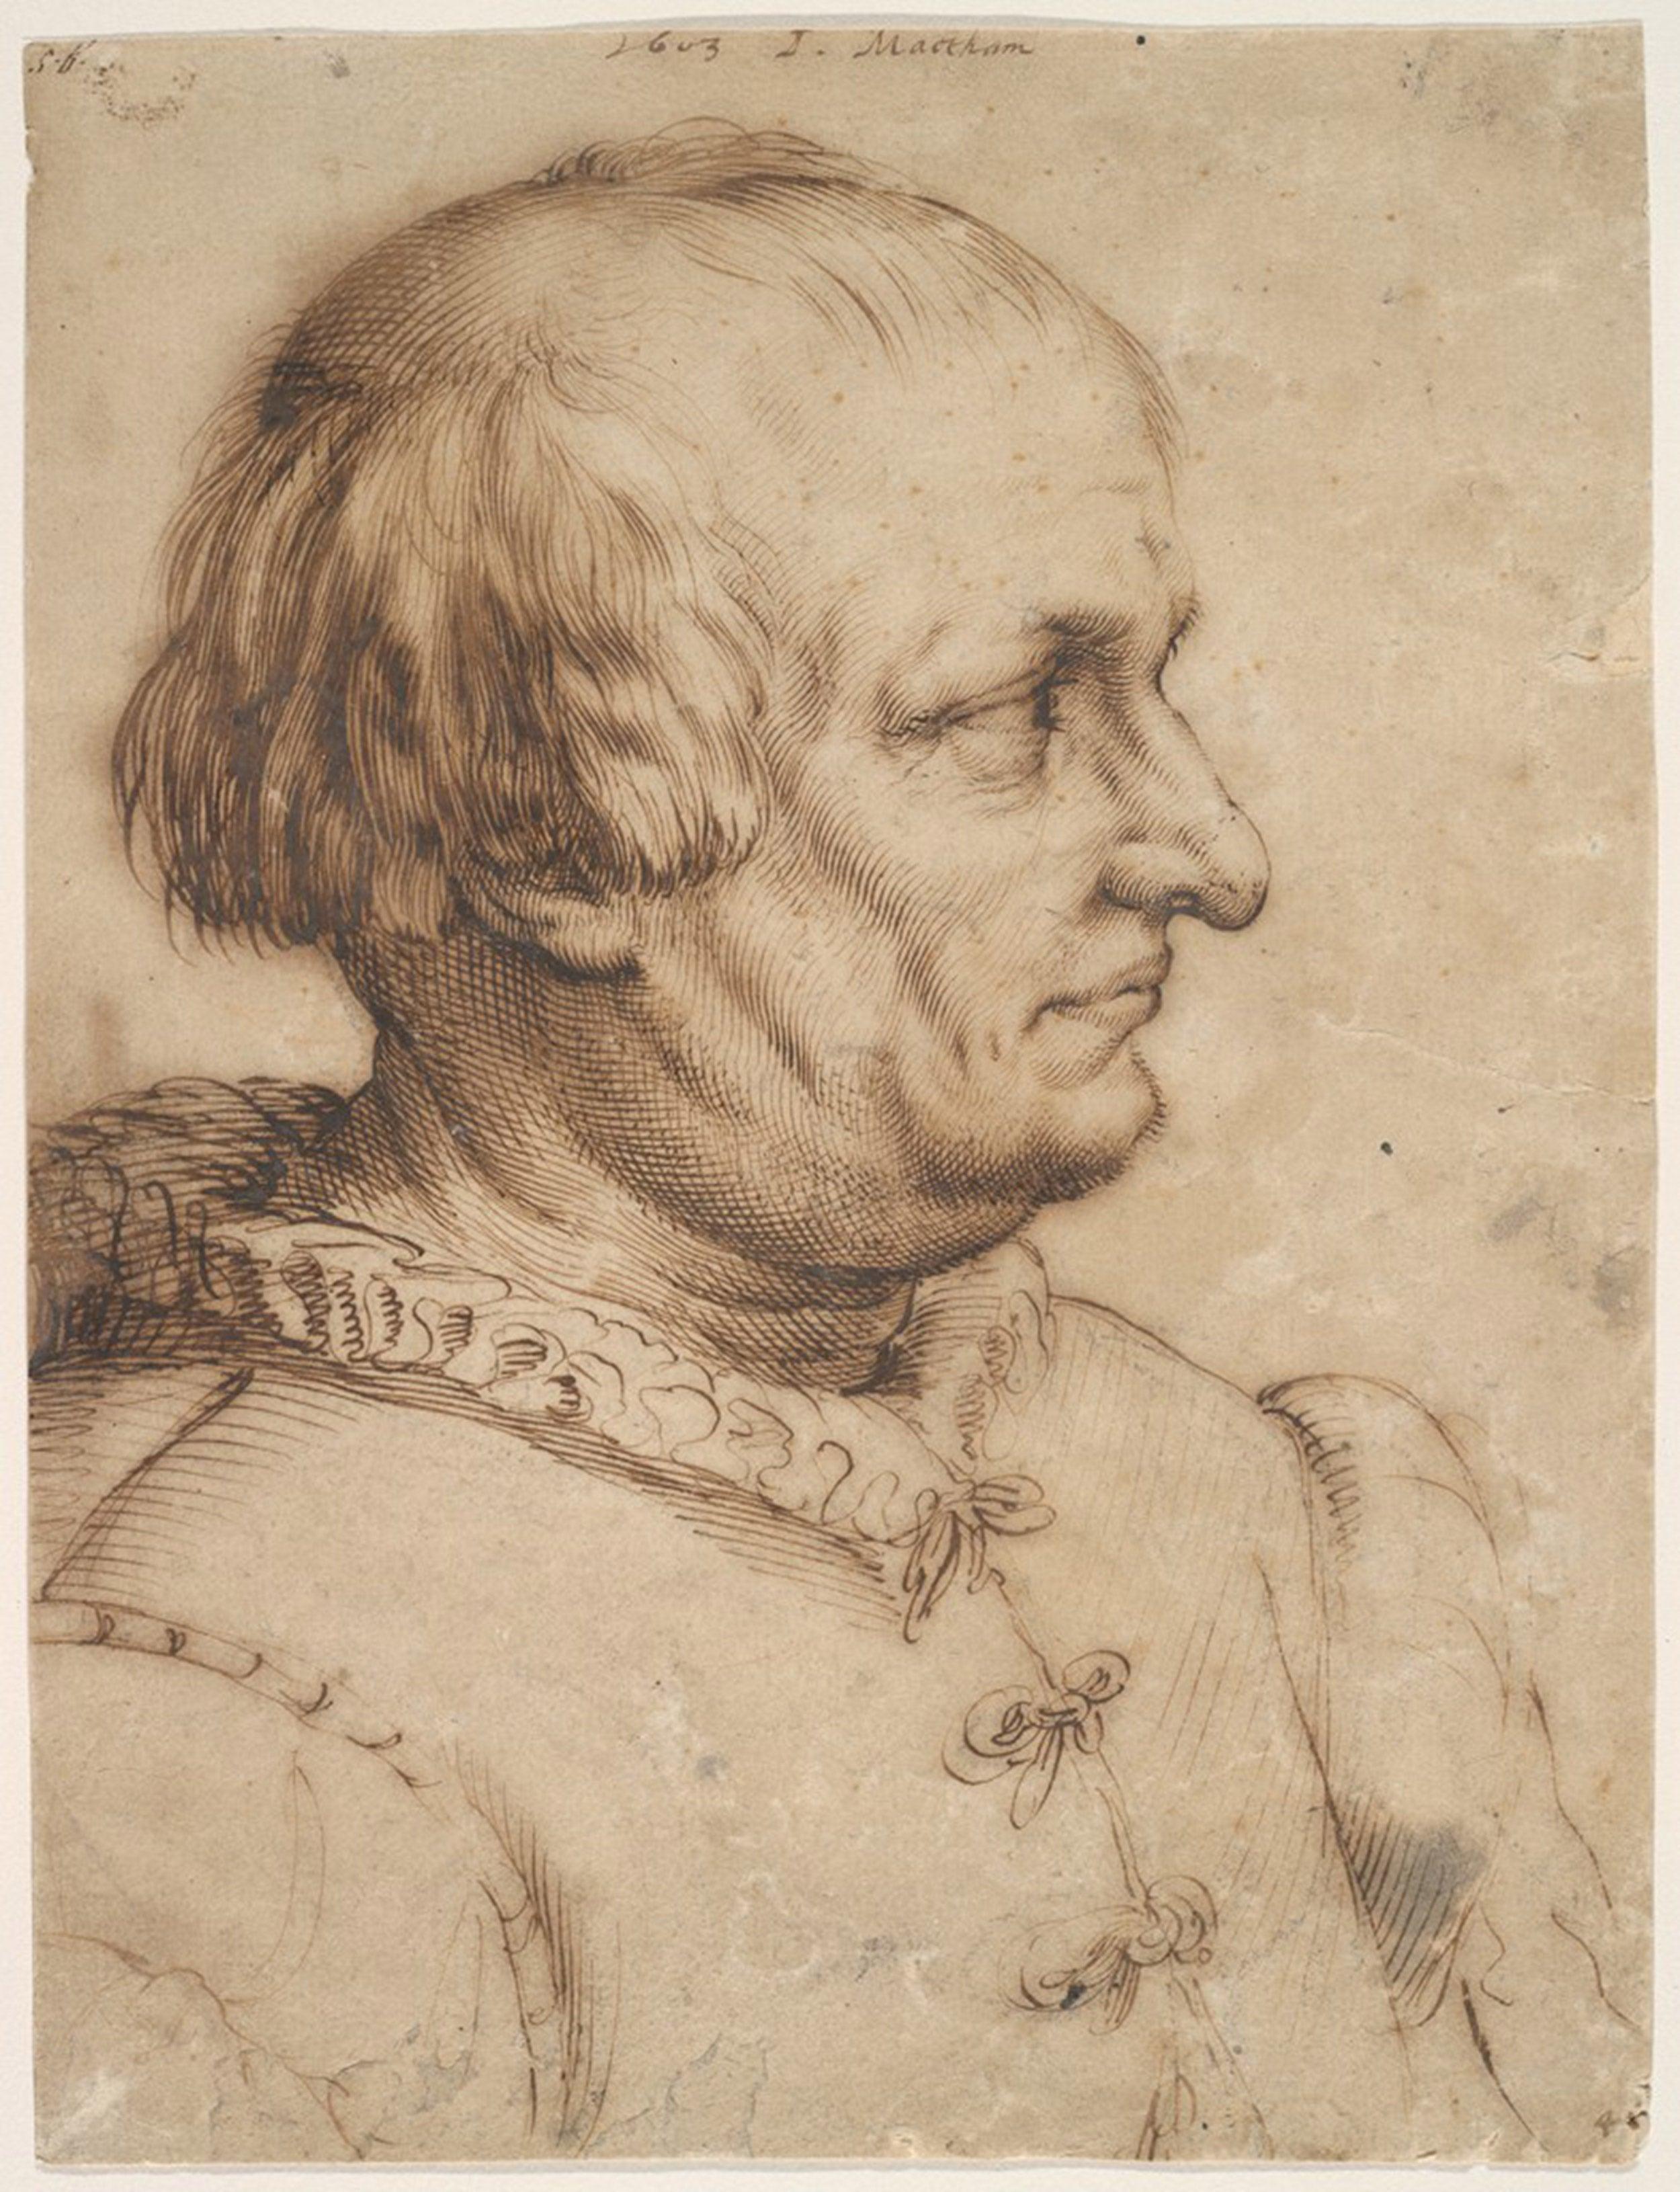 Portrait of a Man by Jacob Matham